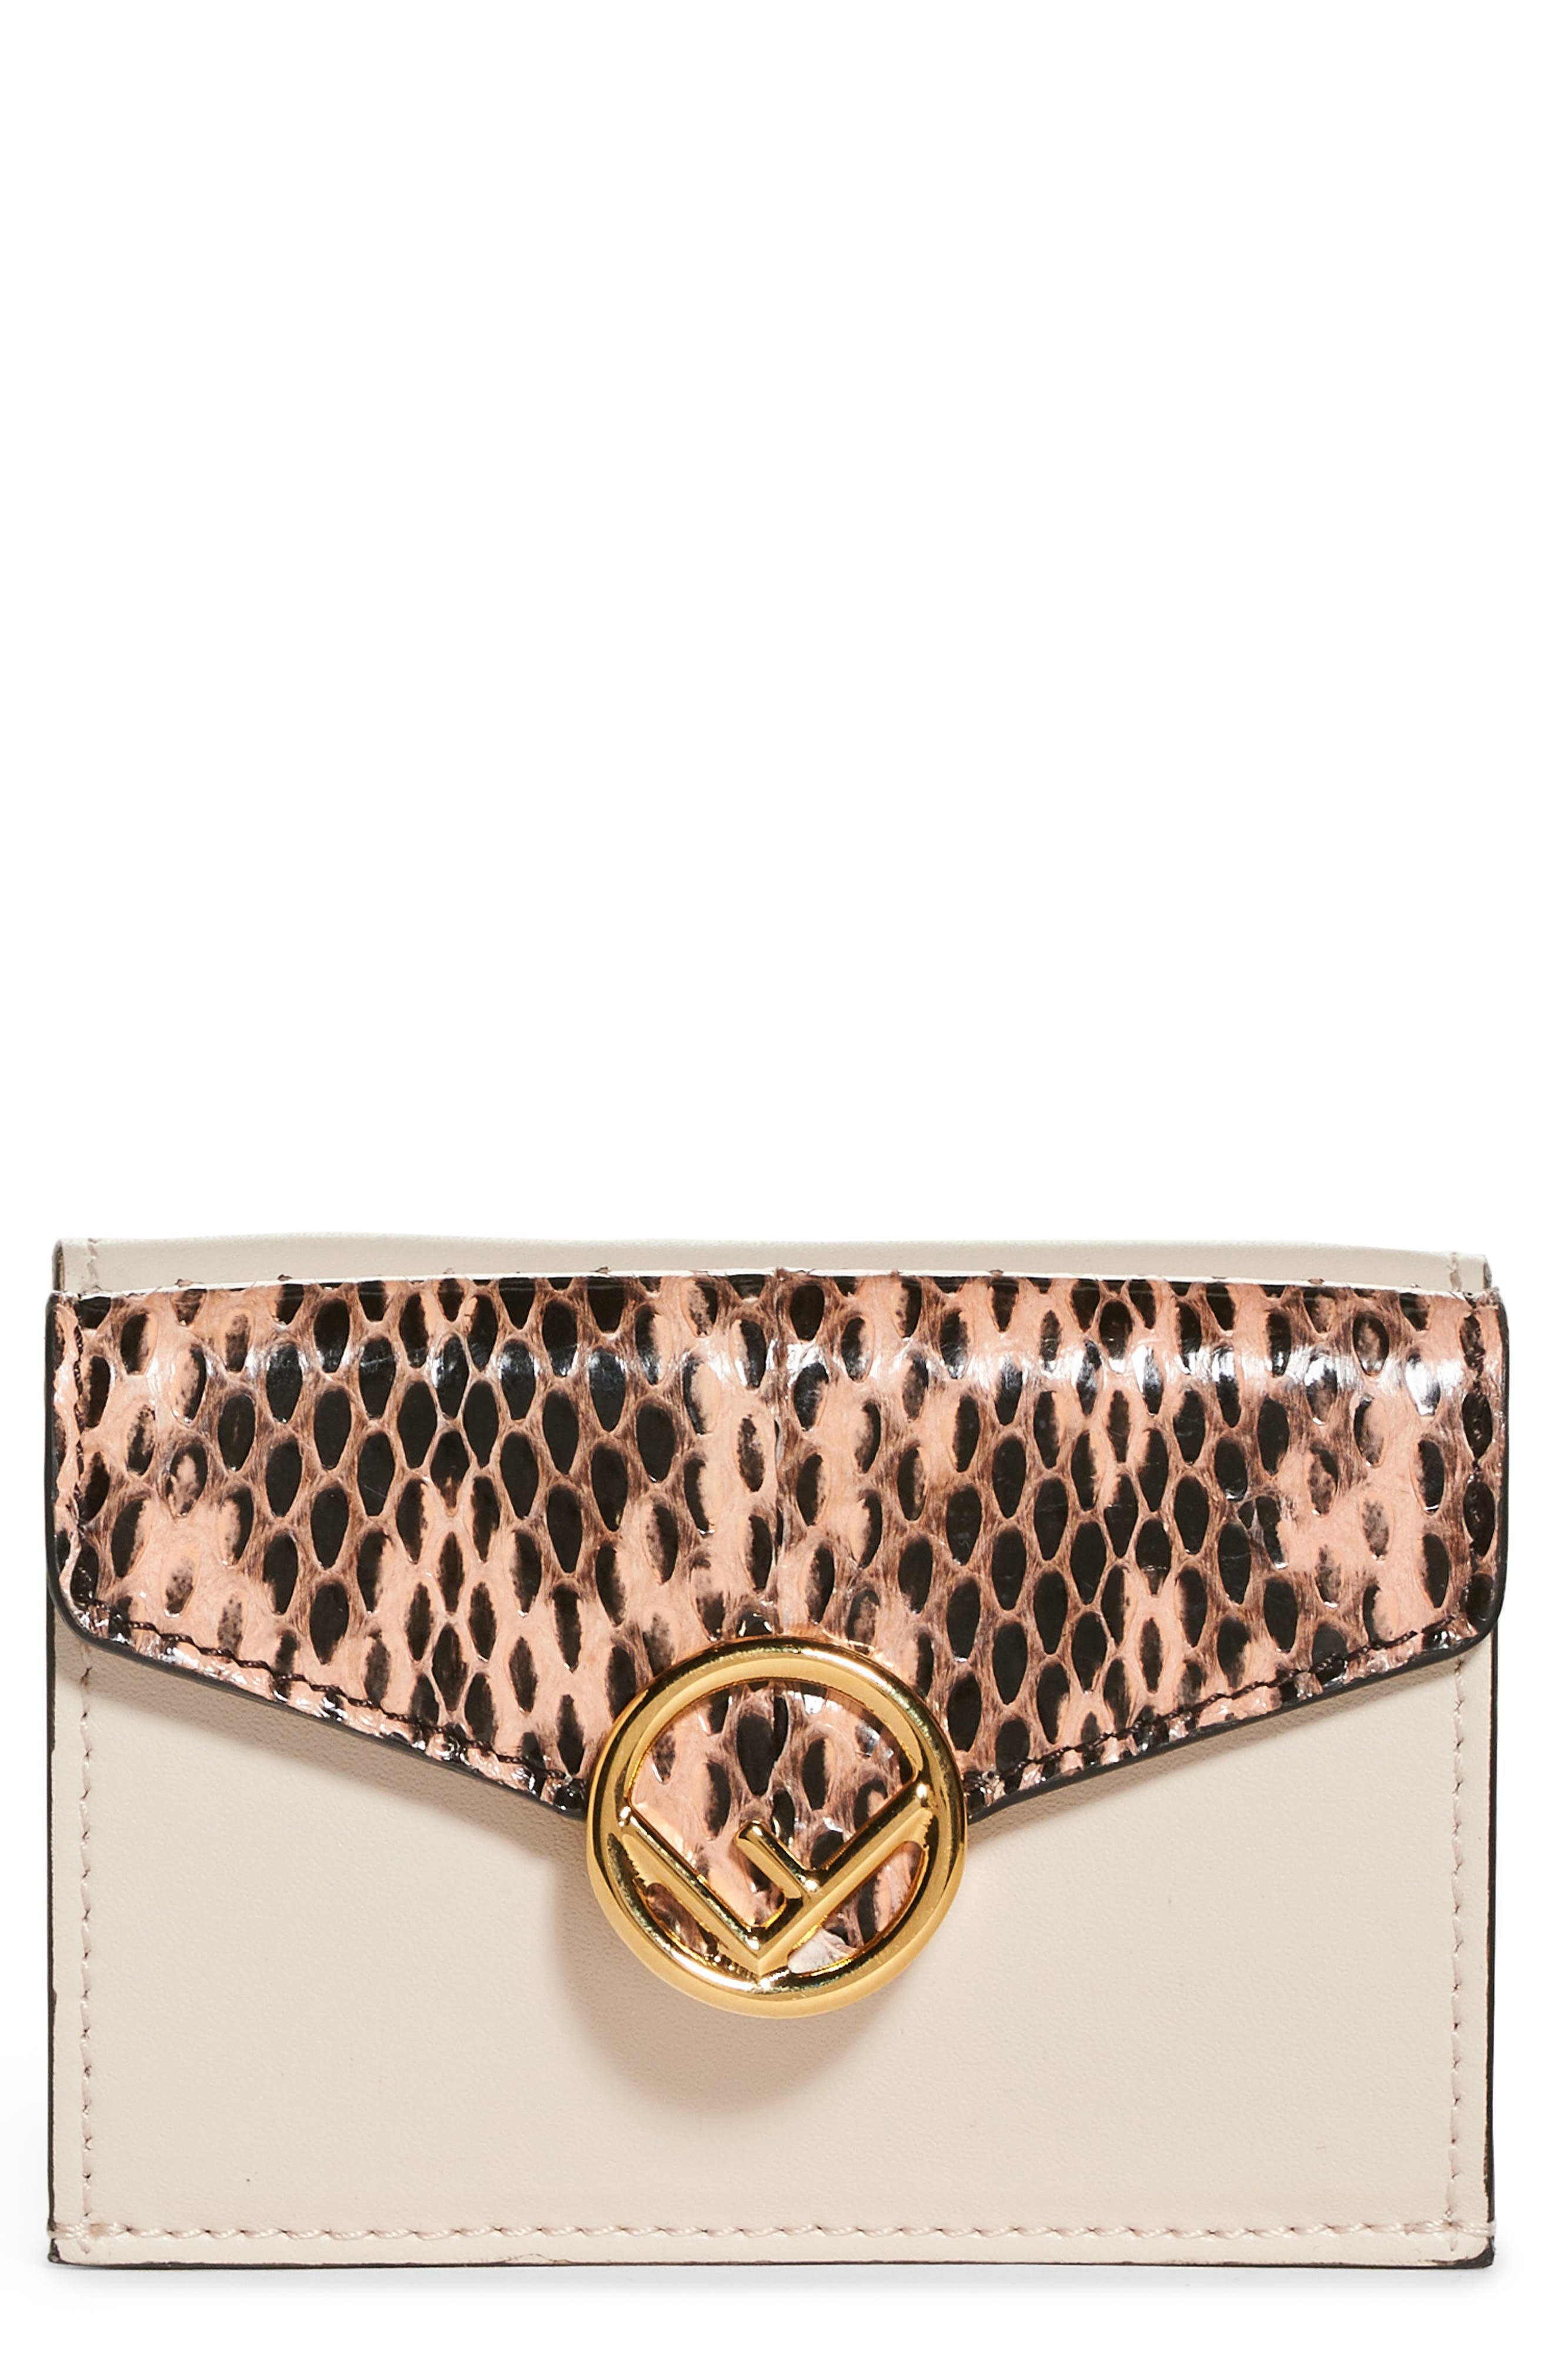 Fendi Kan I Leather & Genuine Snakeskin Trifold Wallet